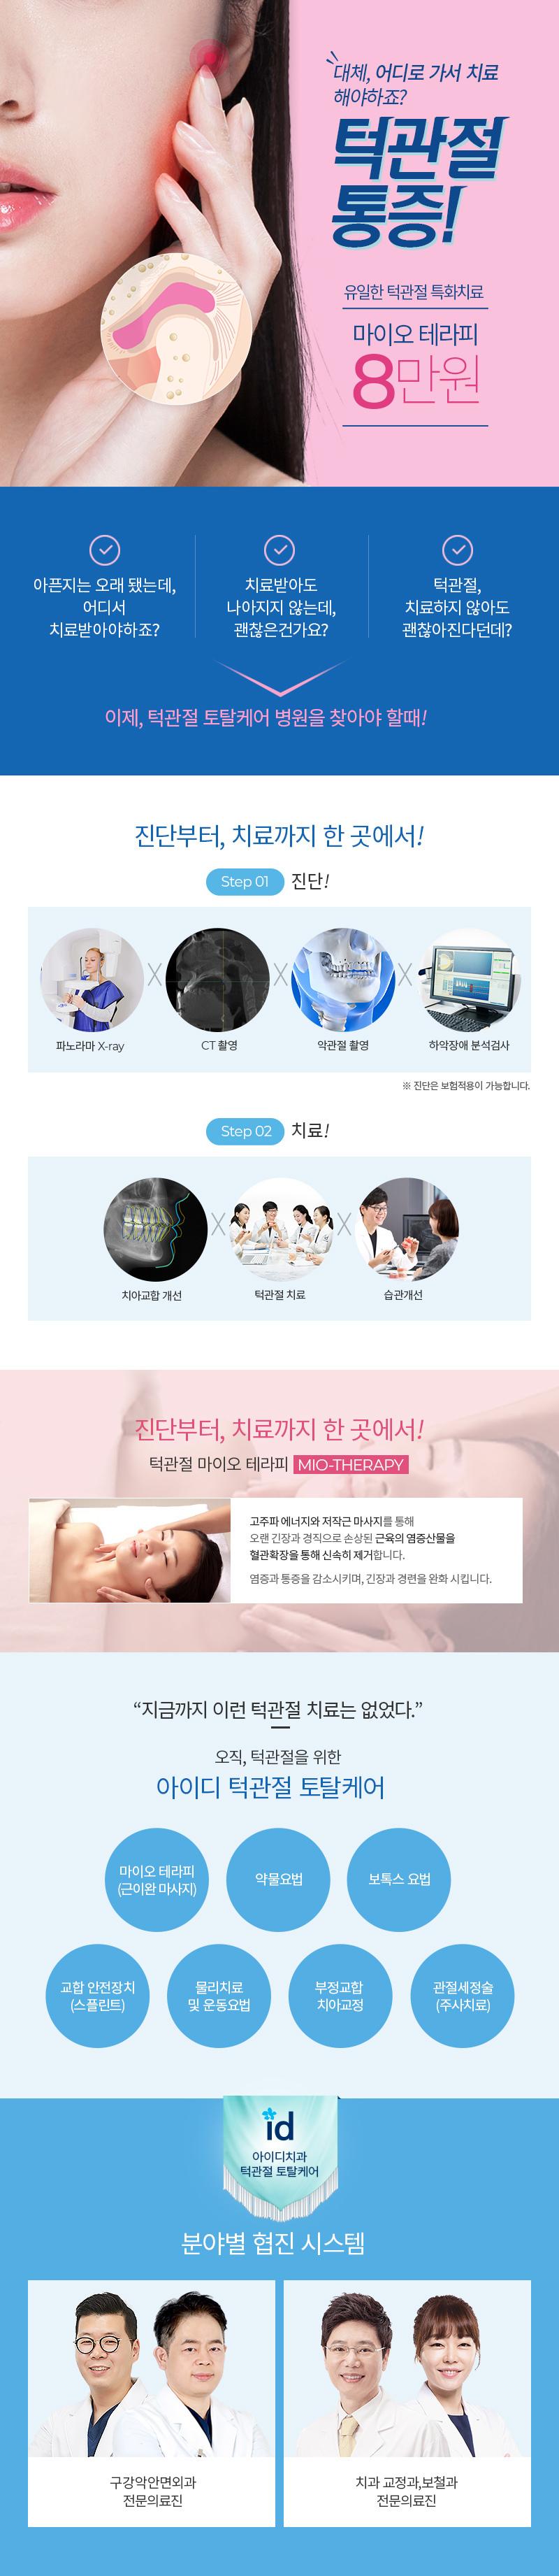 D event info 98952eca99e767bb1f